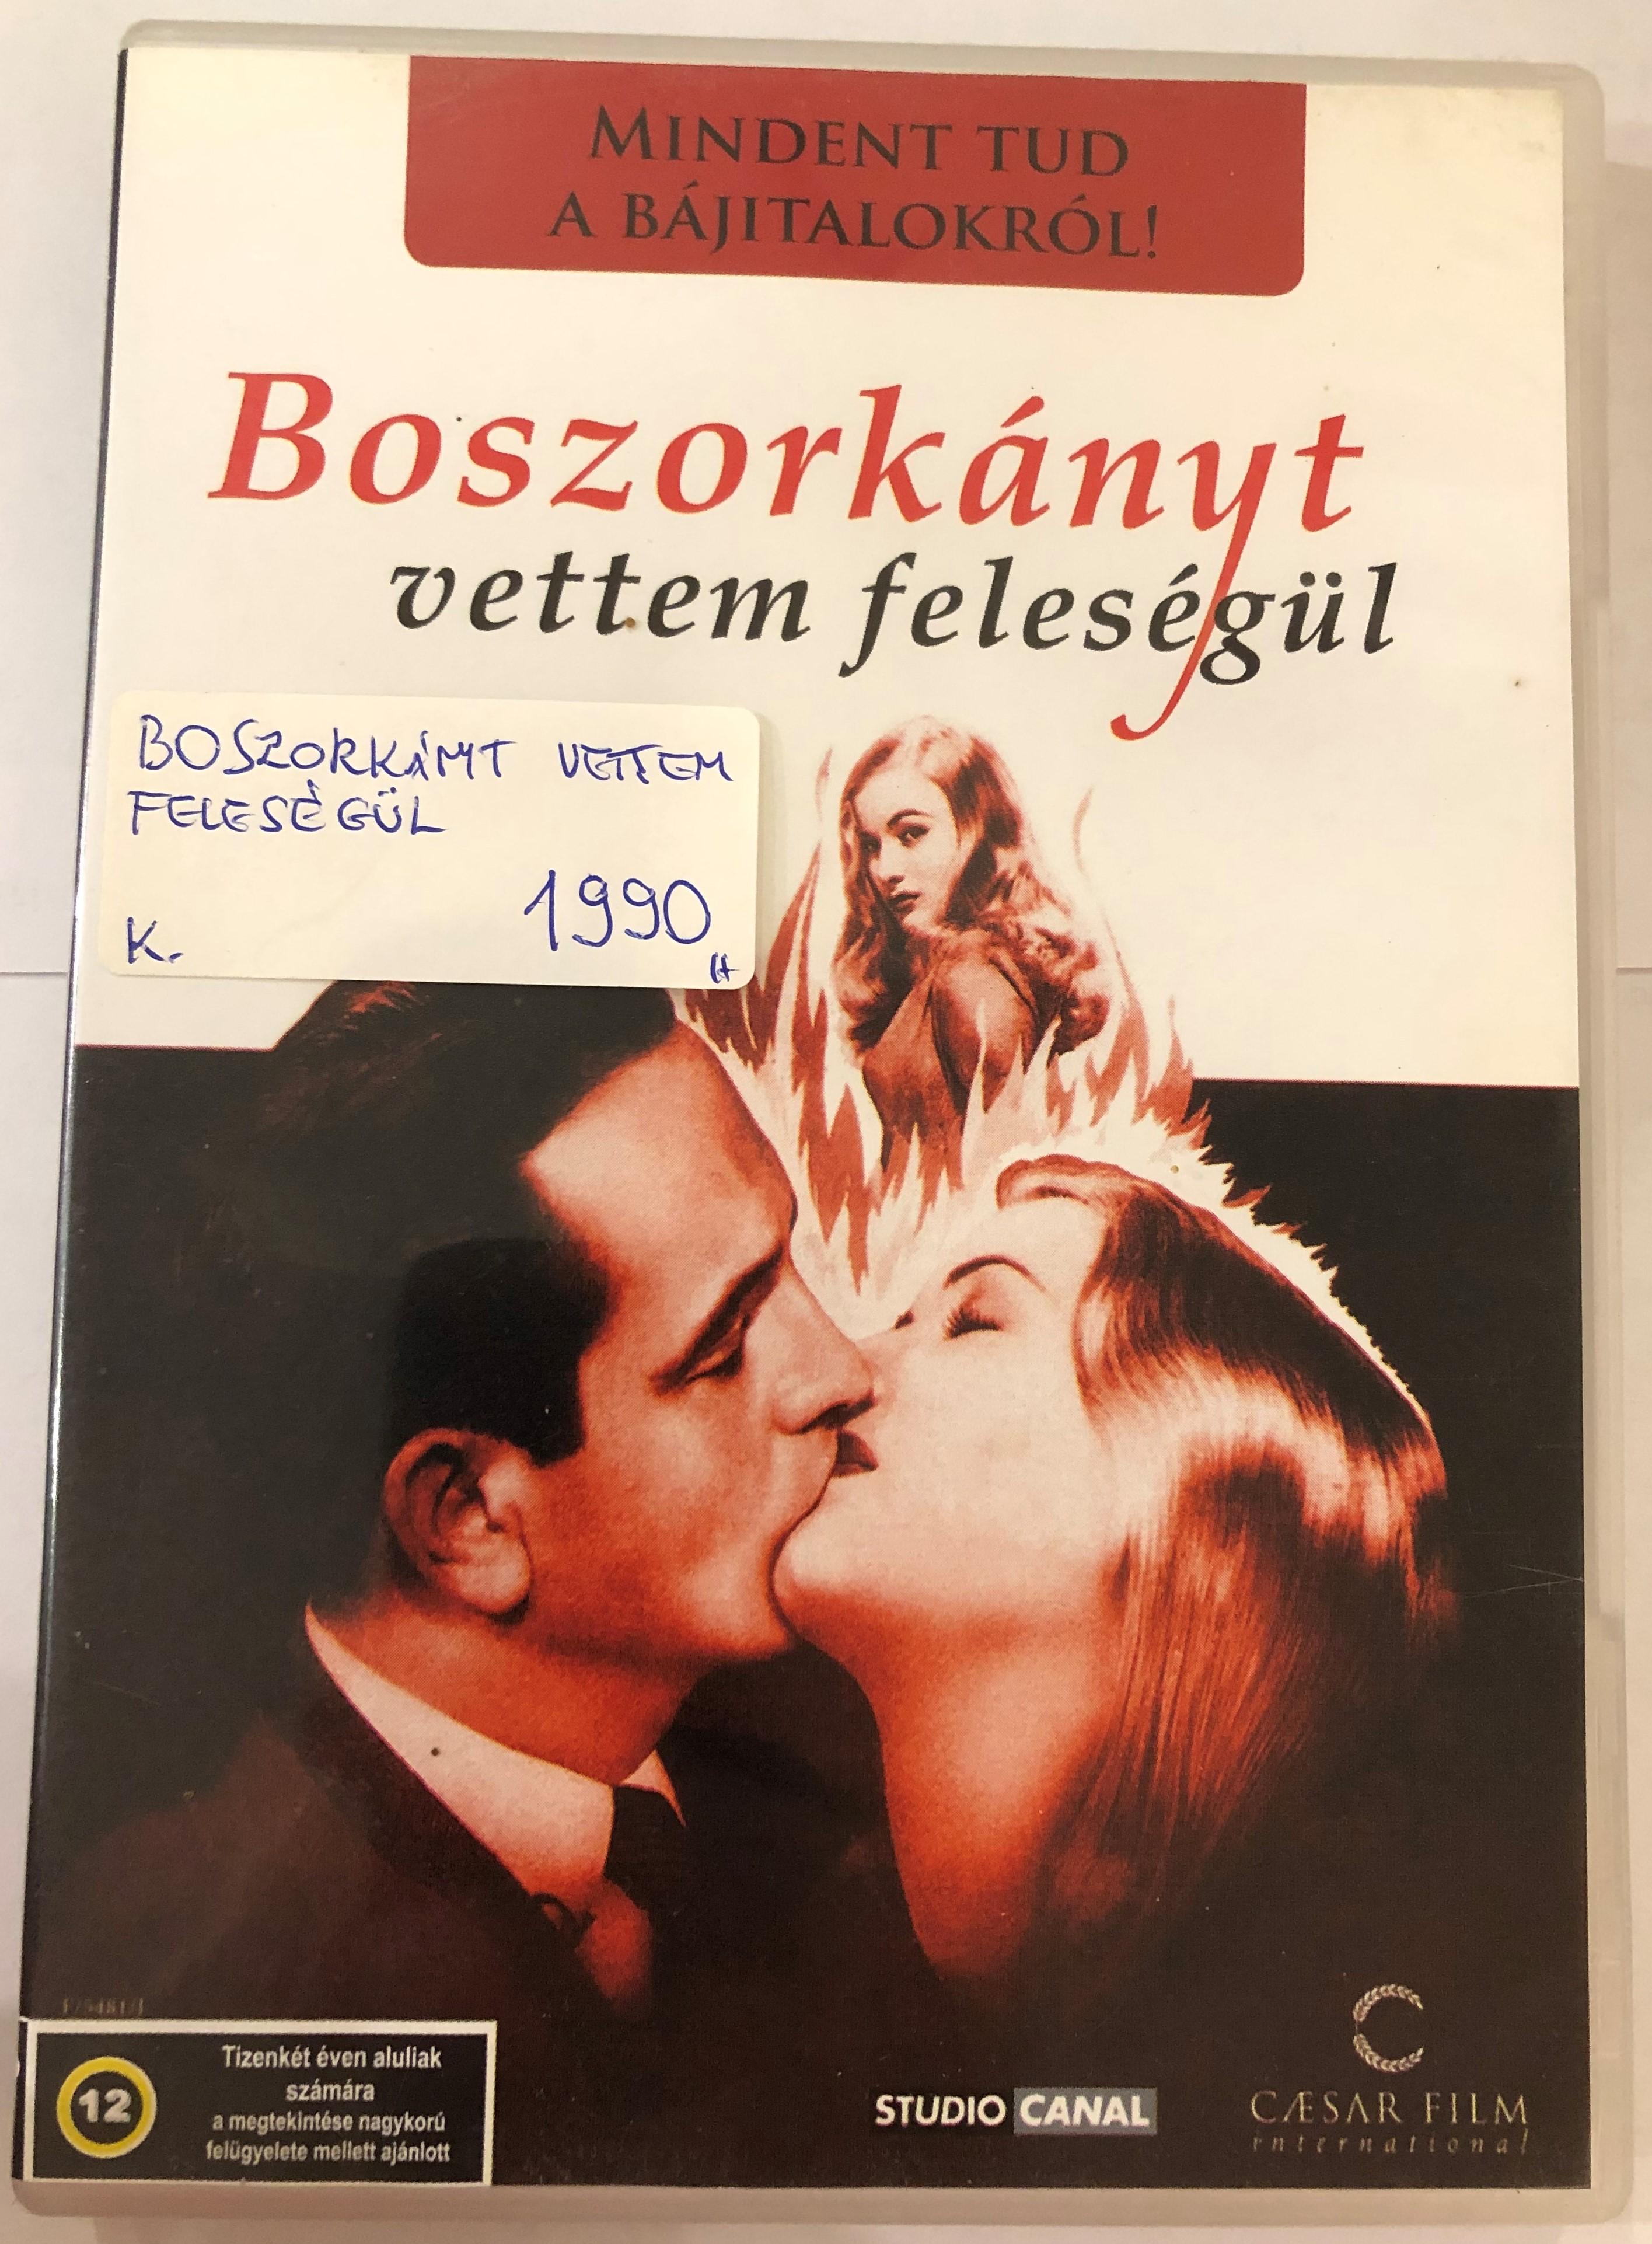 -i-married-a-witch-dvd-1942-boszork-nyt-vettem-feles-g-l-1-.jpg